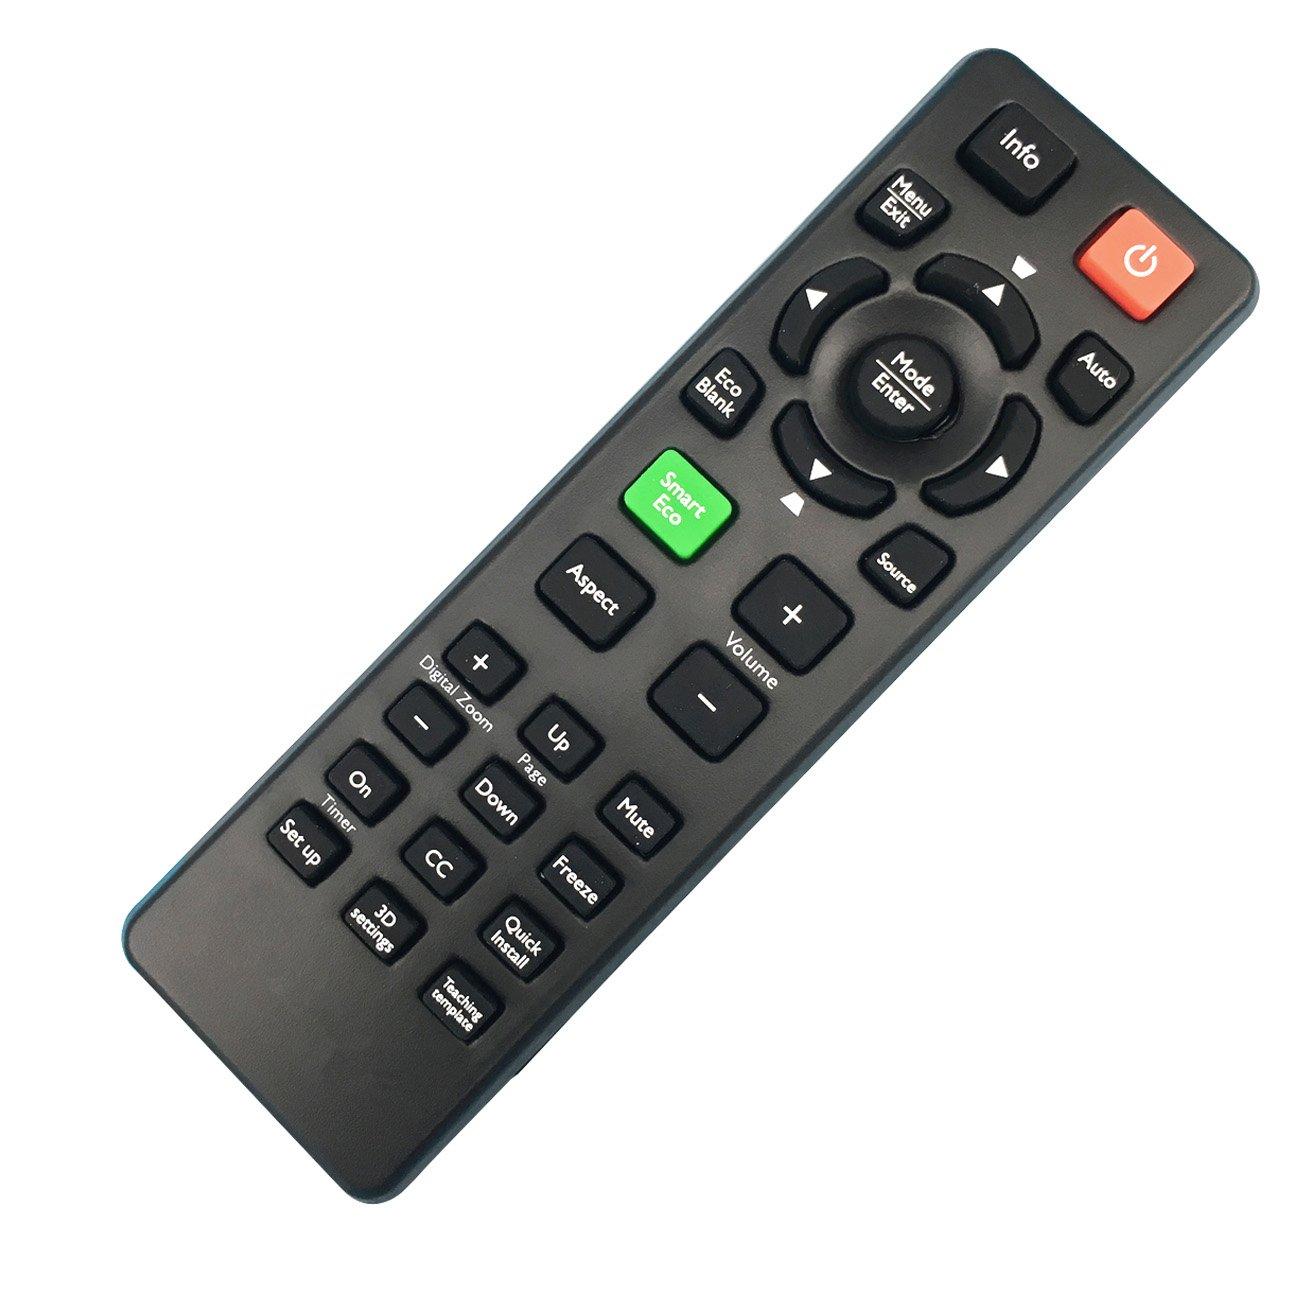 5J.J9V06.001 Remote Control for BenQ Projector Benq MS524 MW526 HC1200 MX525 SH915 MX722 SX912 SX914 MX711 MX812ST MX810ST MX760 MX761 Projectors ect. by HONONJO